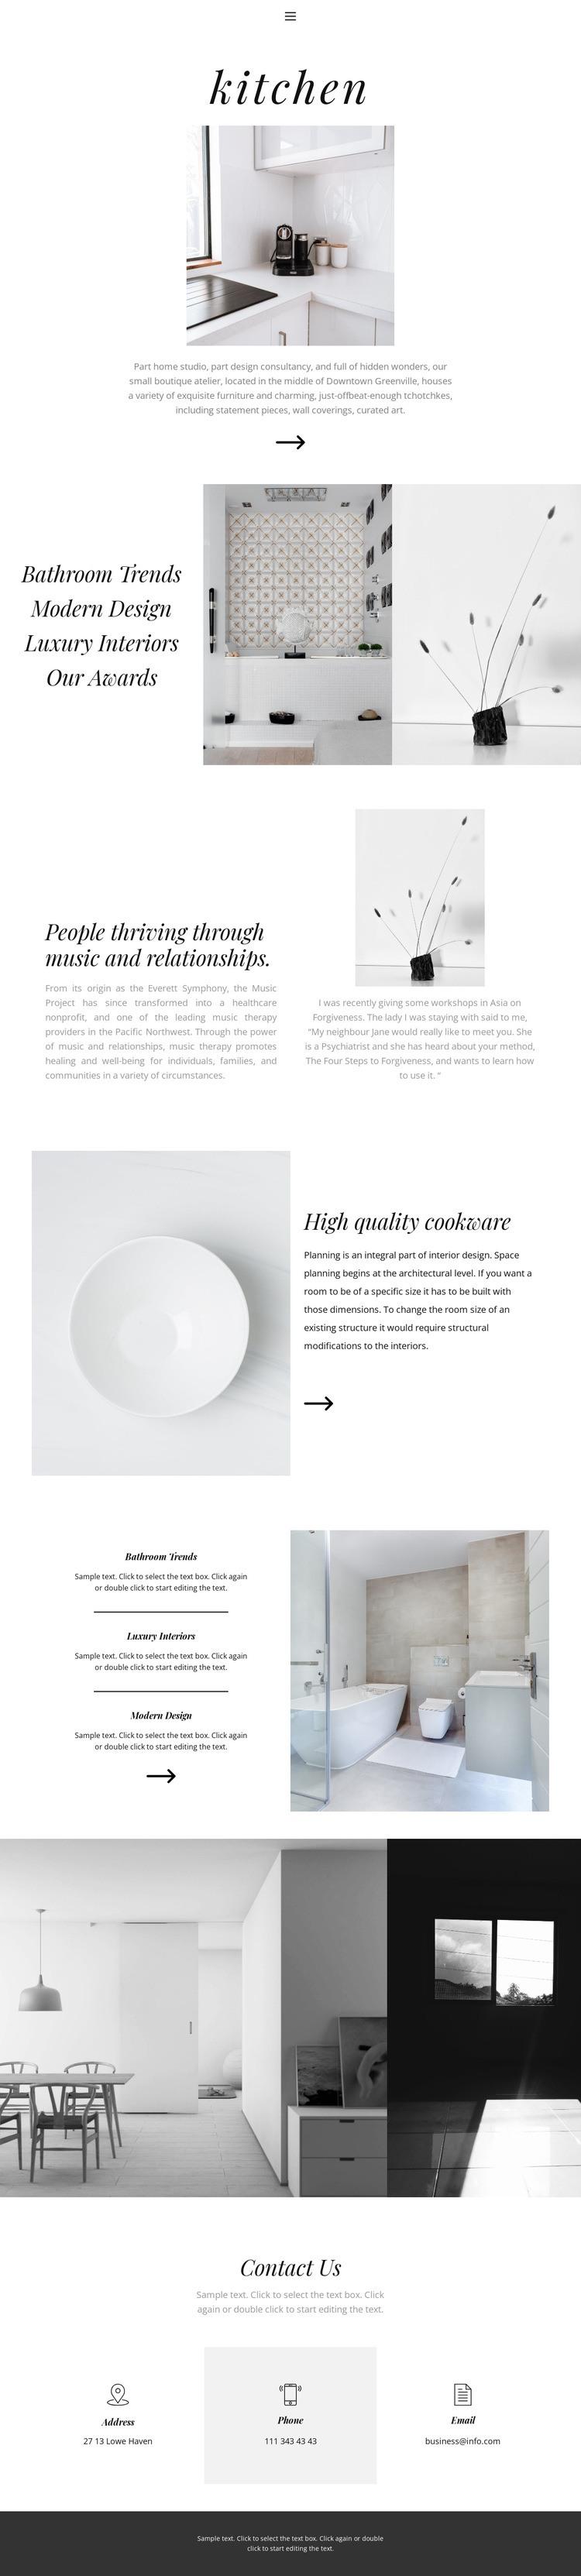 Turnkey interior Web Page Designer